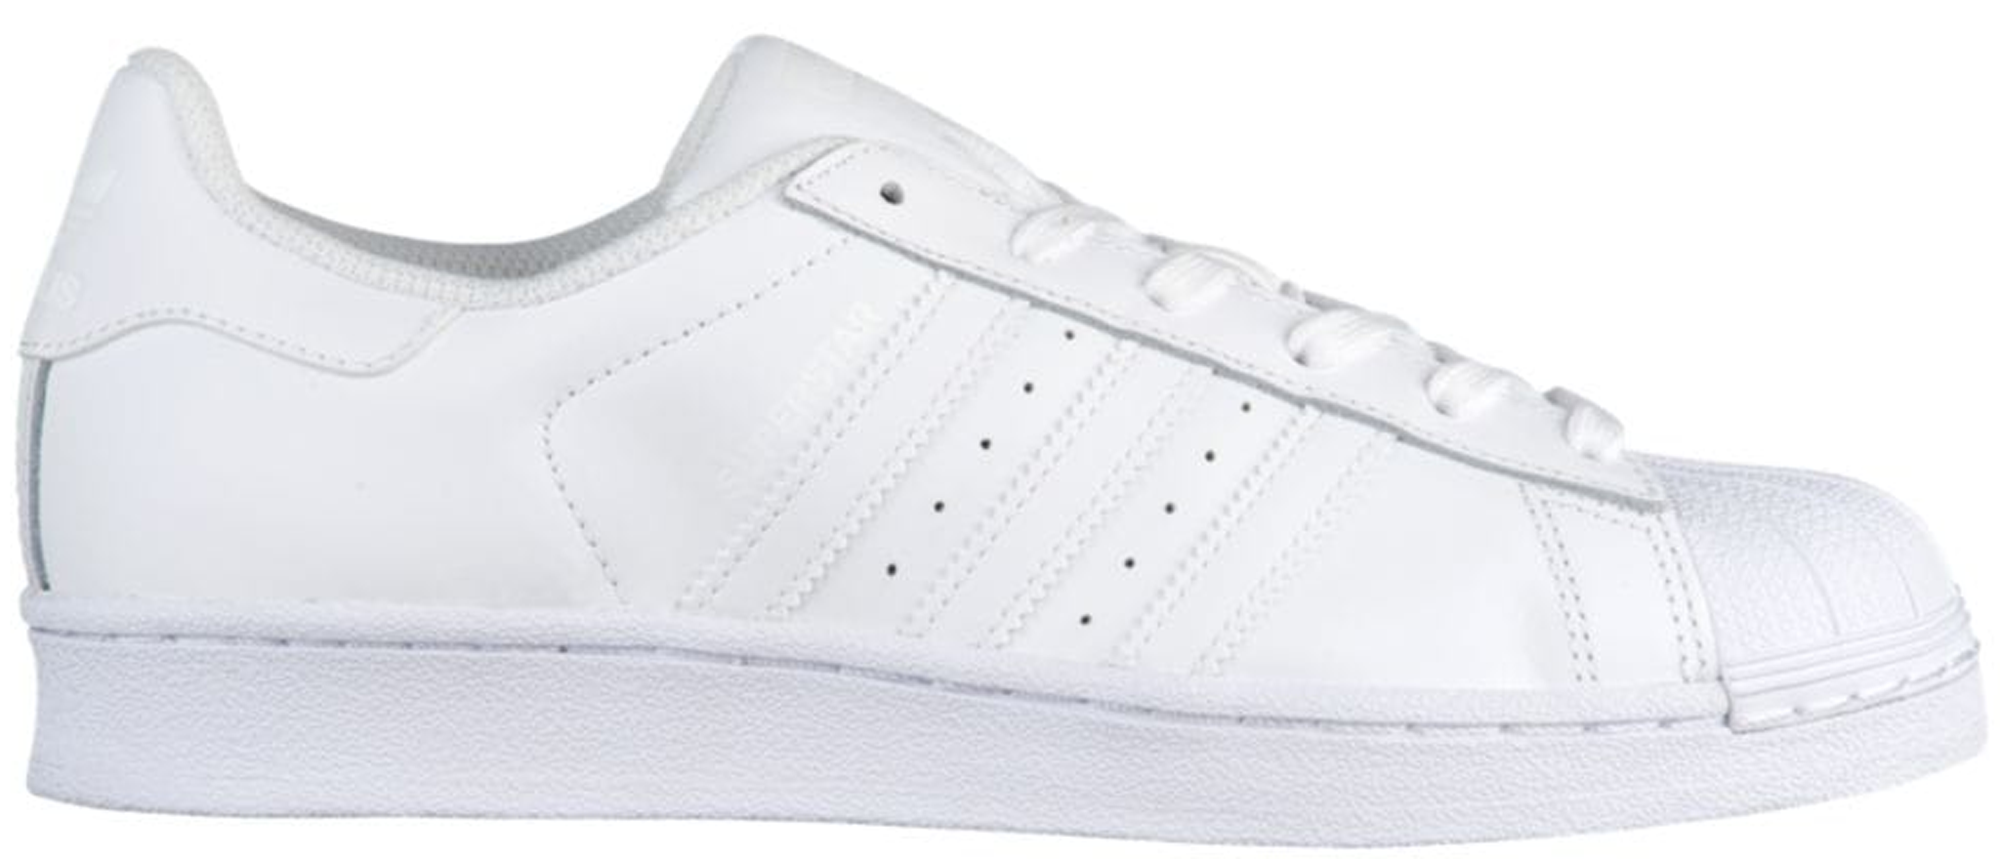 adidas Superstar Triple White (W) - S85139